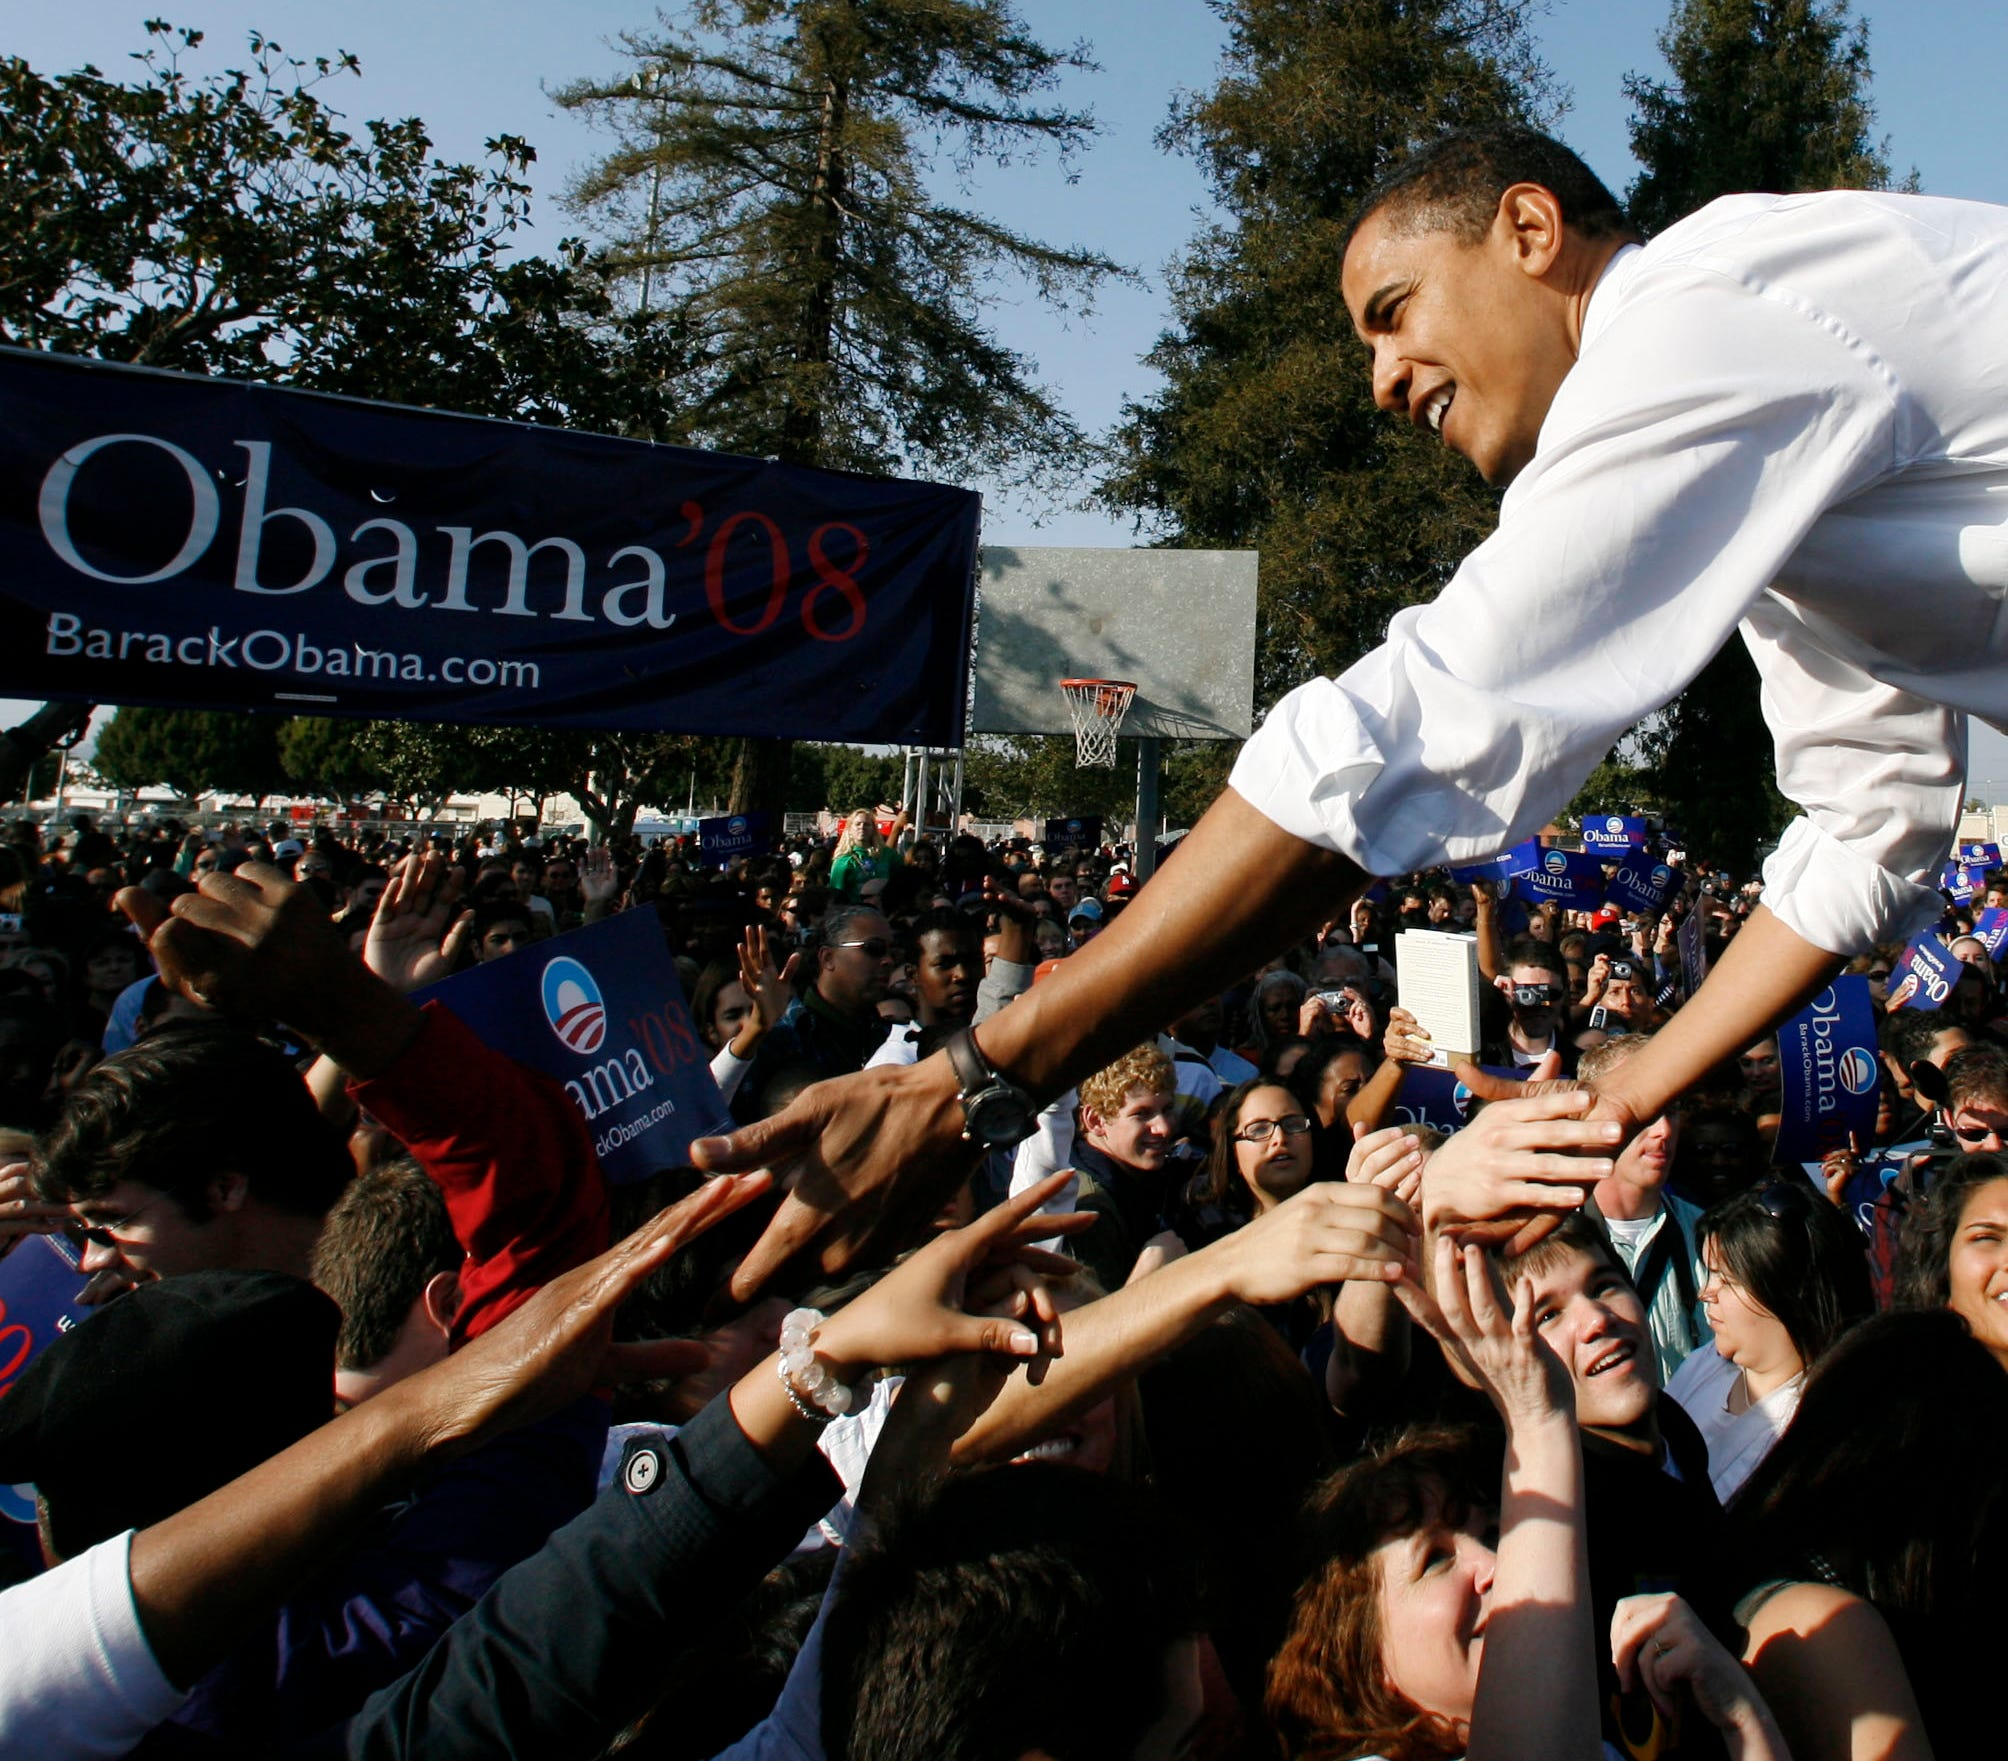 Xxx Obama 2008 Dec 4402 Jpg A Eln Usa Ca